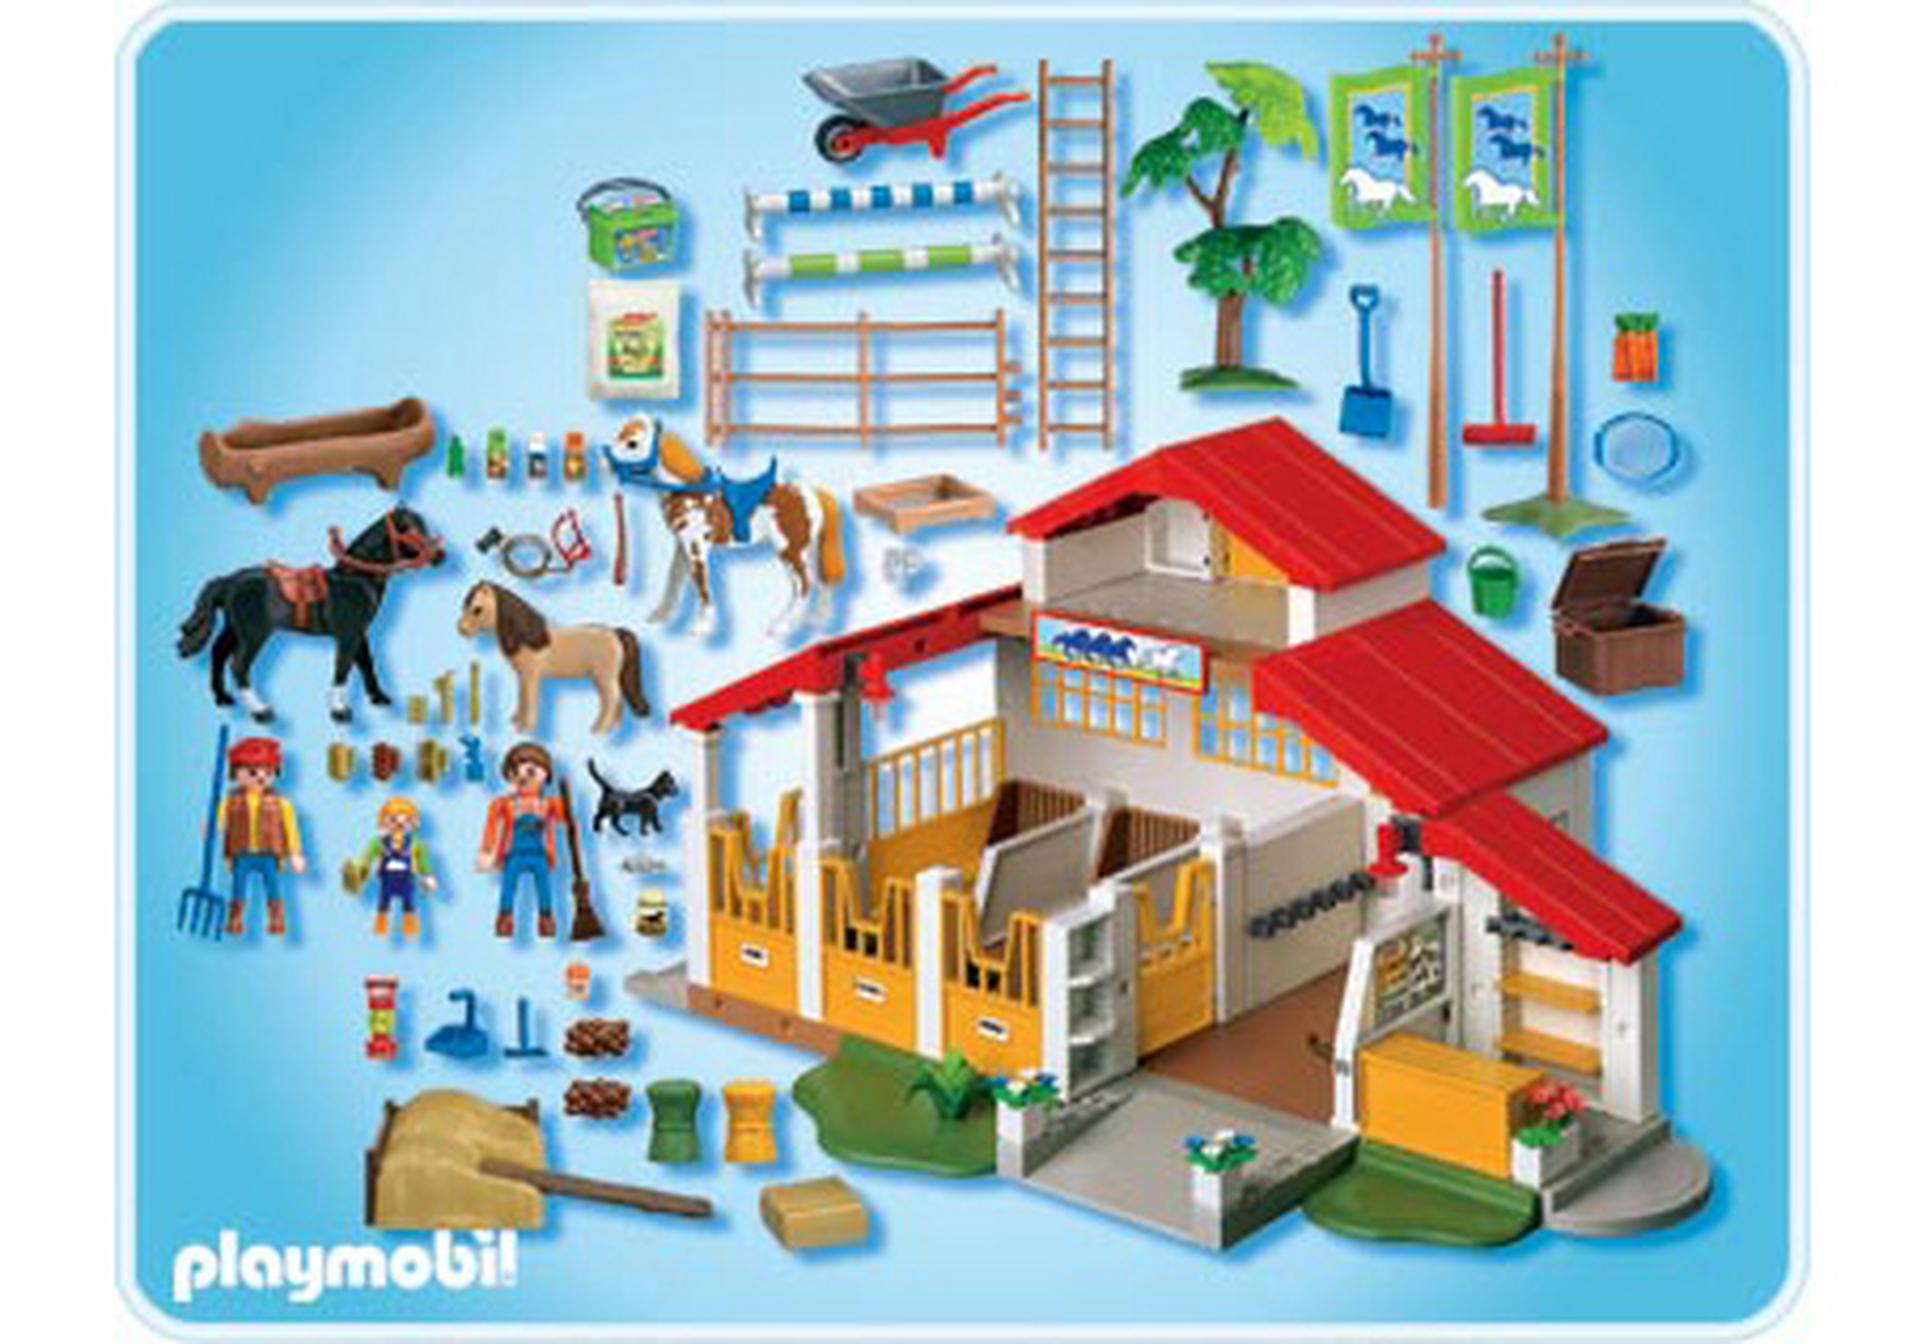 Mediaplaymobil I Playmobil 4190